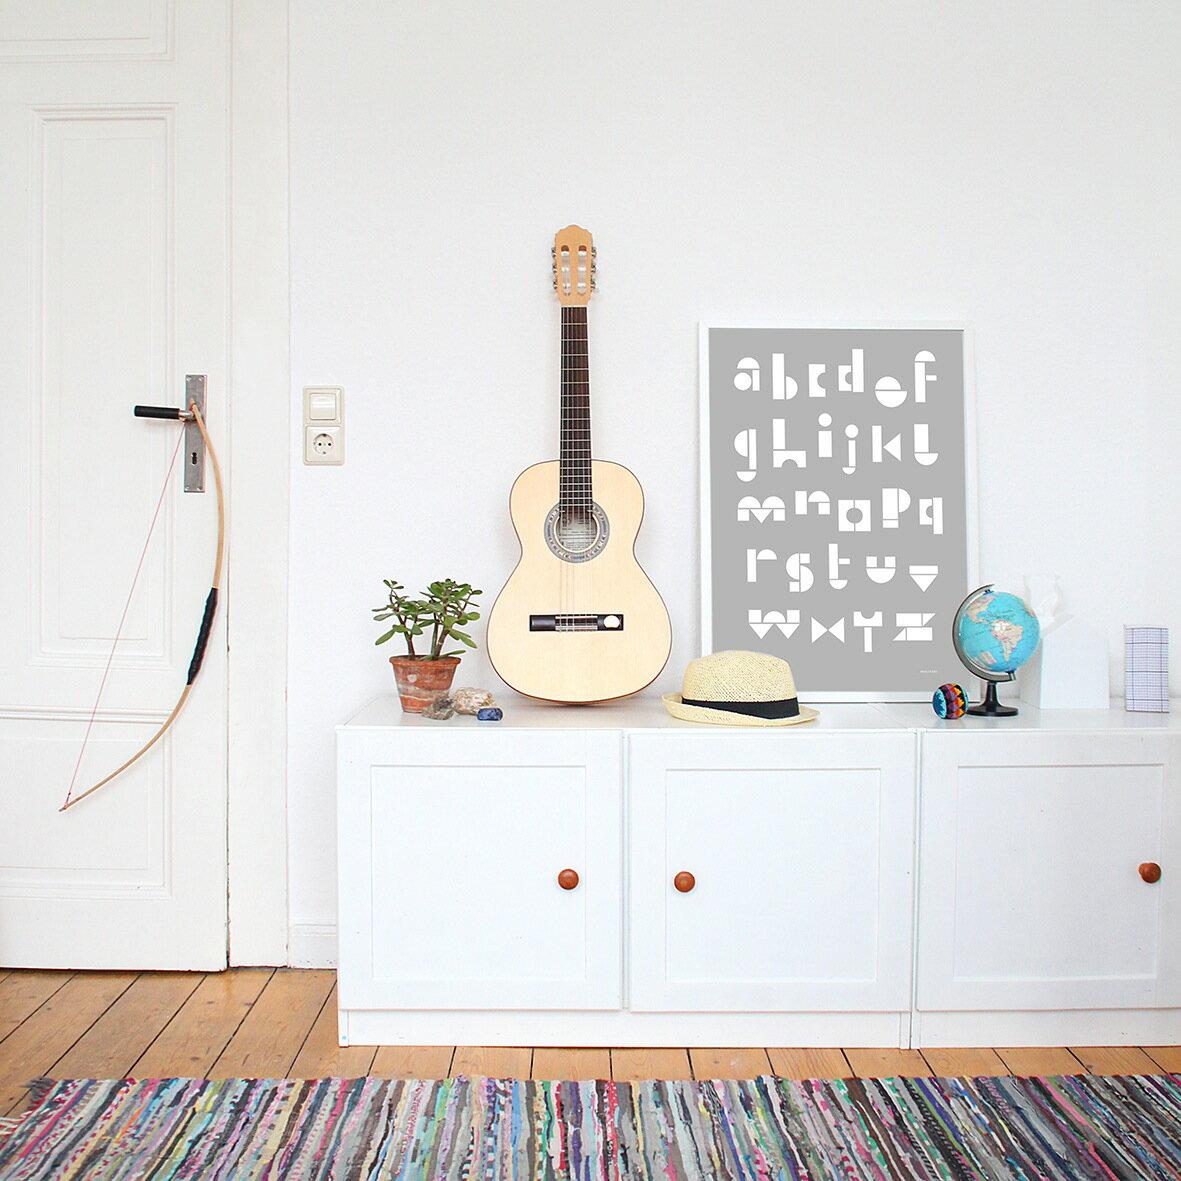 snug.studio | snug.abc - poster (light grey) | ポスター (50x70cm)